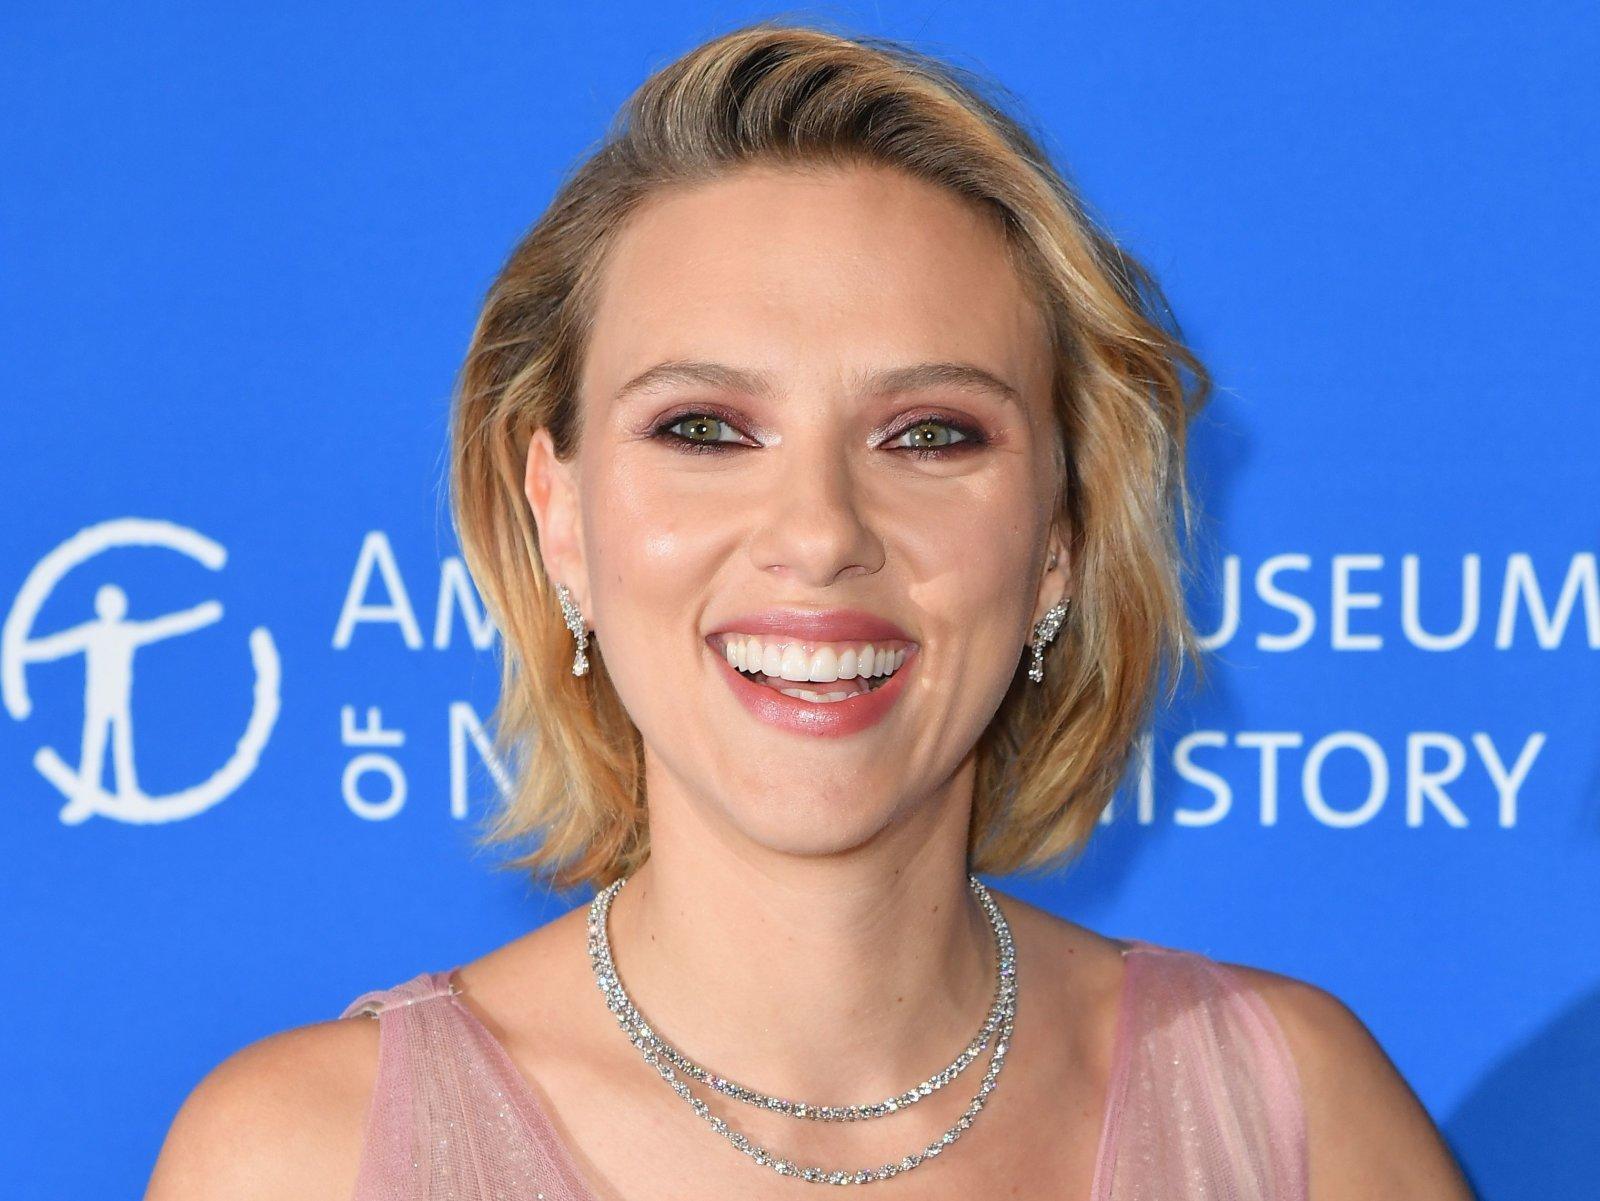 Scarlett Johansson says fighting deepfake porn is fruitless 1600x1201